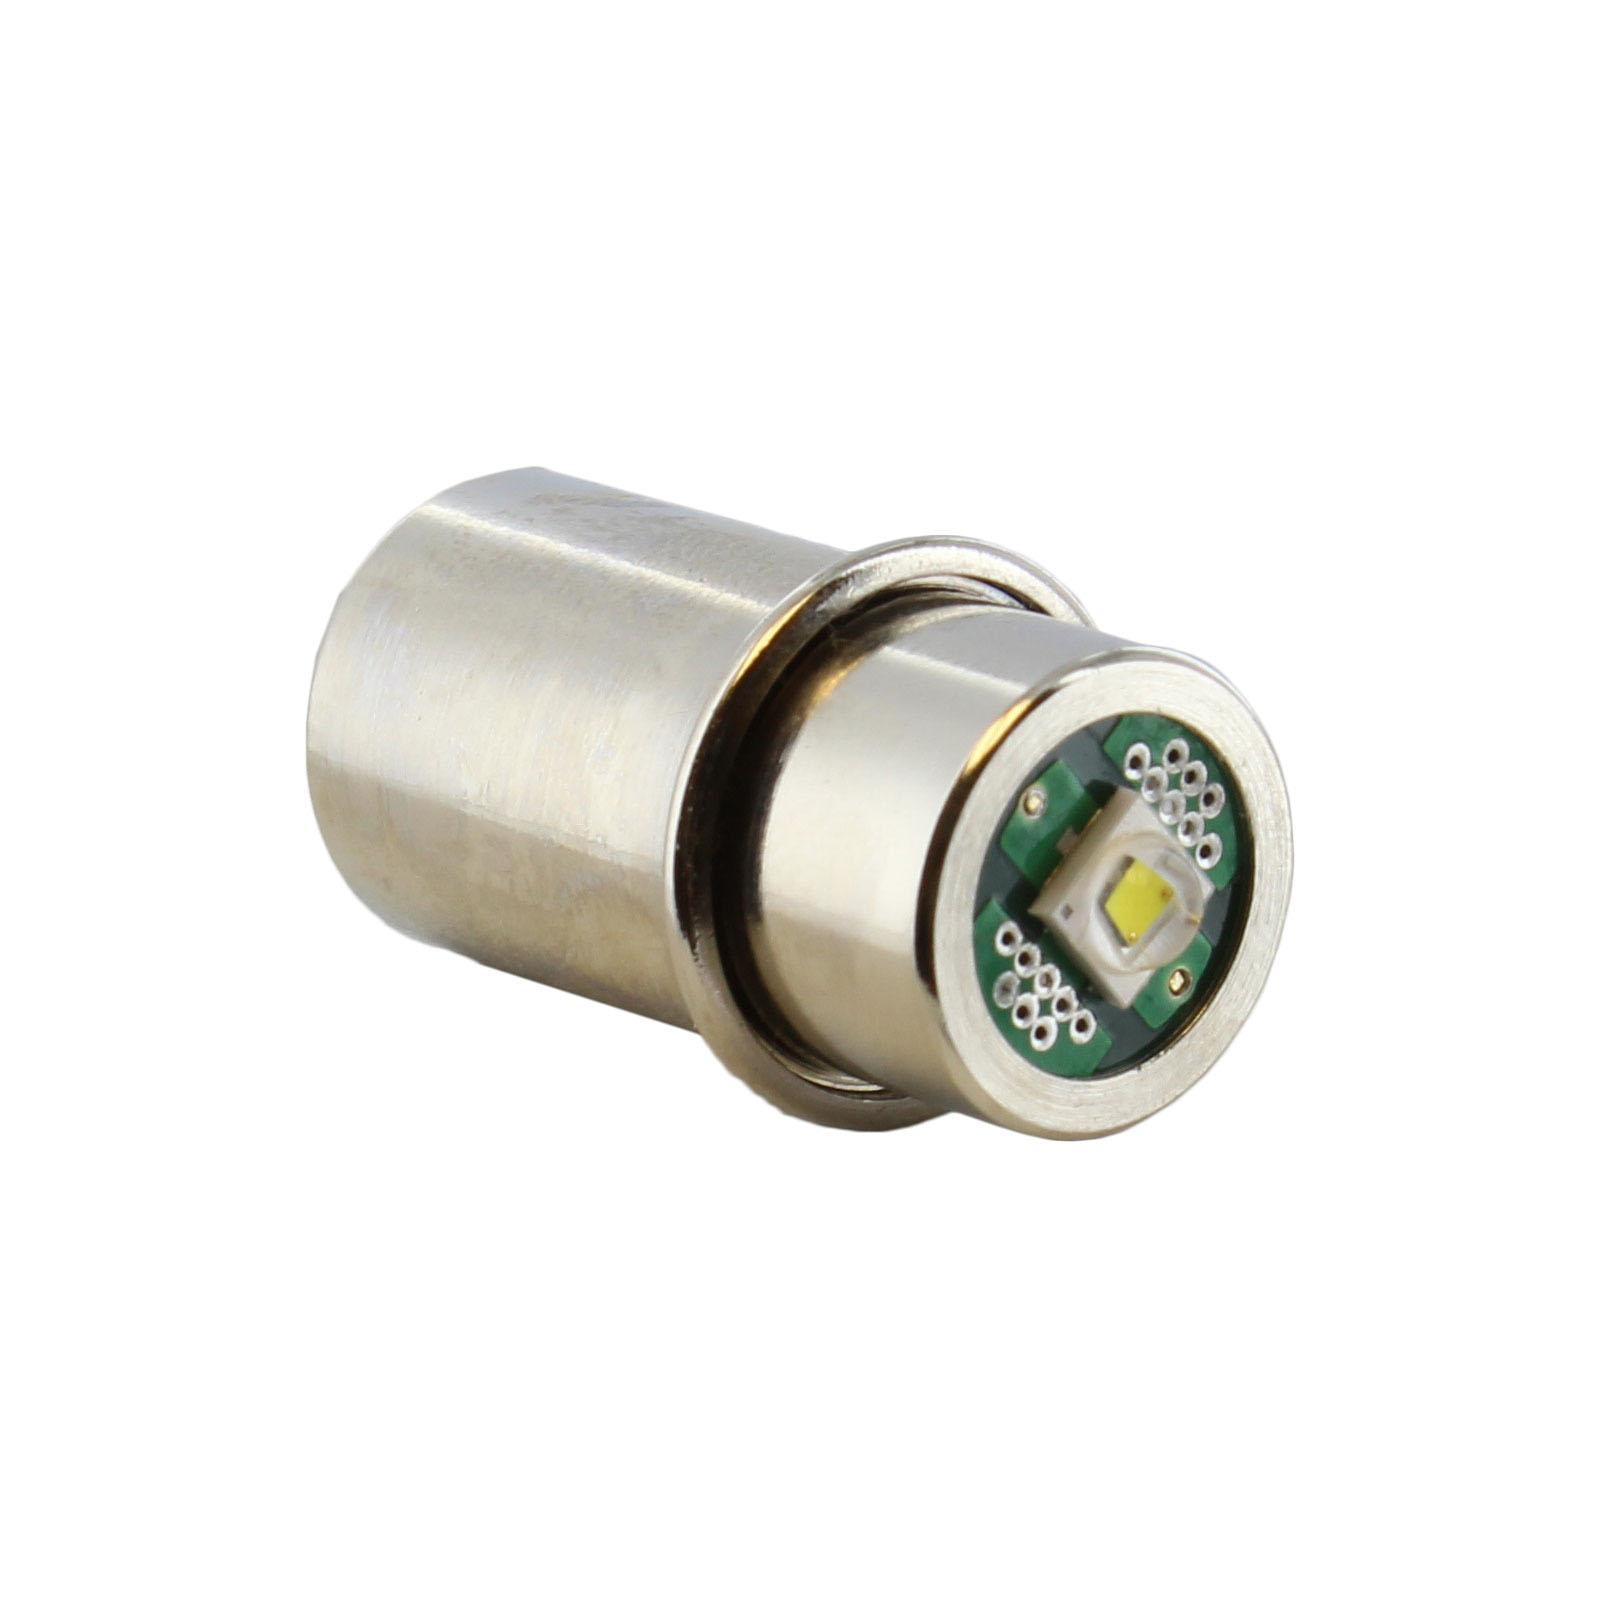 Abn Led Bulbs For Maglite Flashlight Ebay